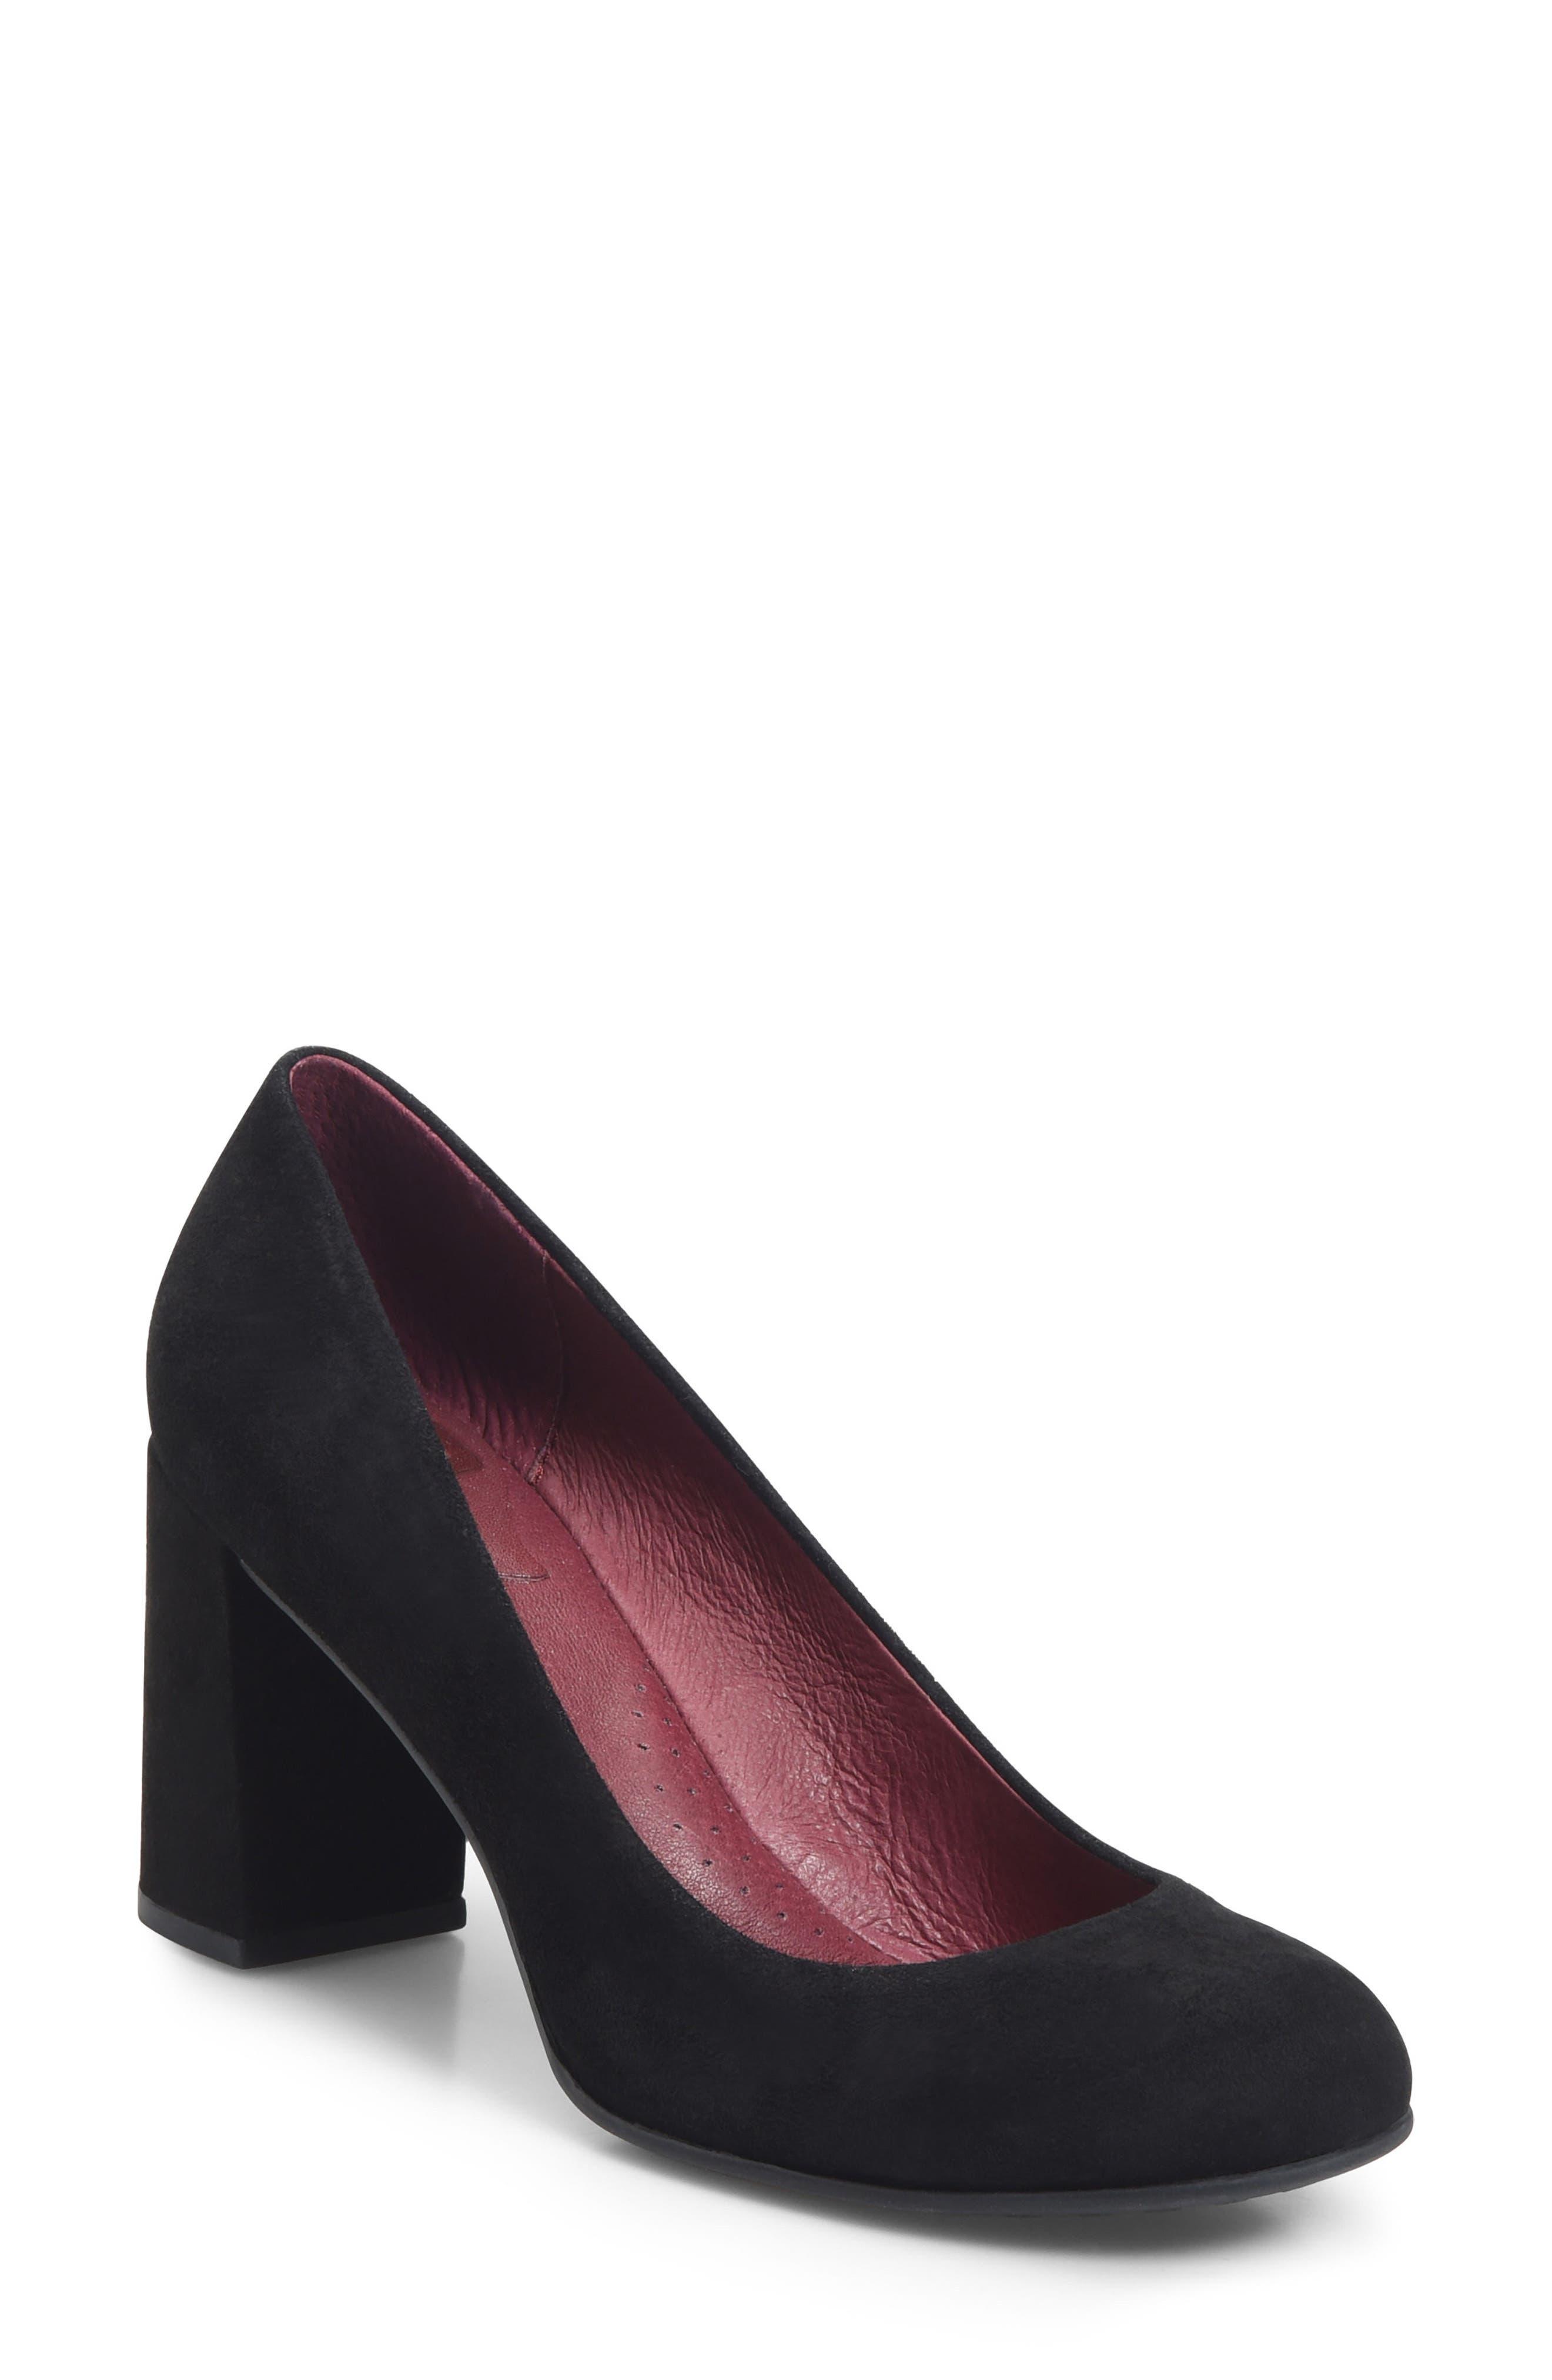 Alternate Image 1 Selected - ONO Alpena Block Heel Pump (Women)